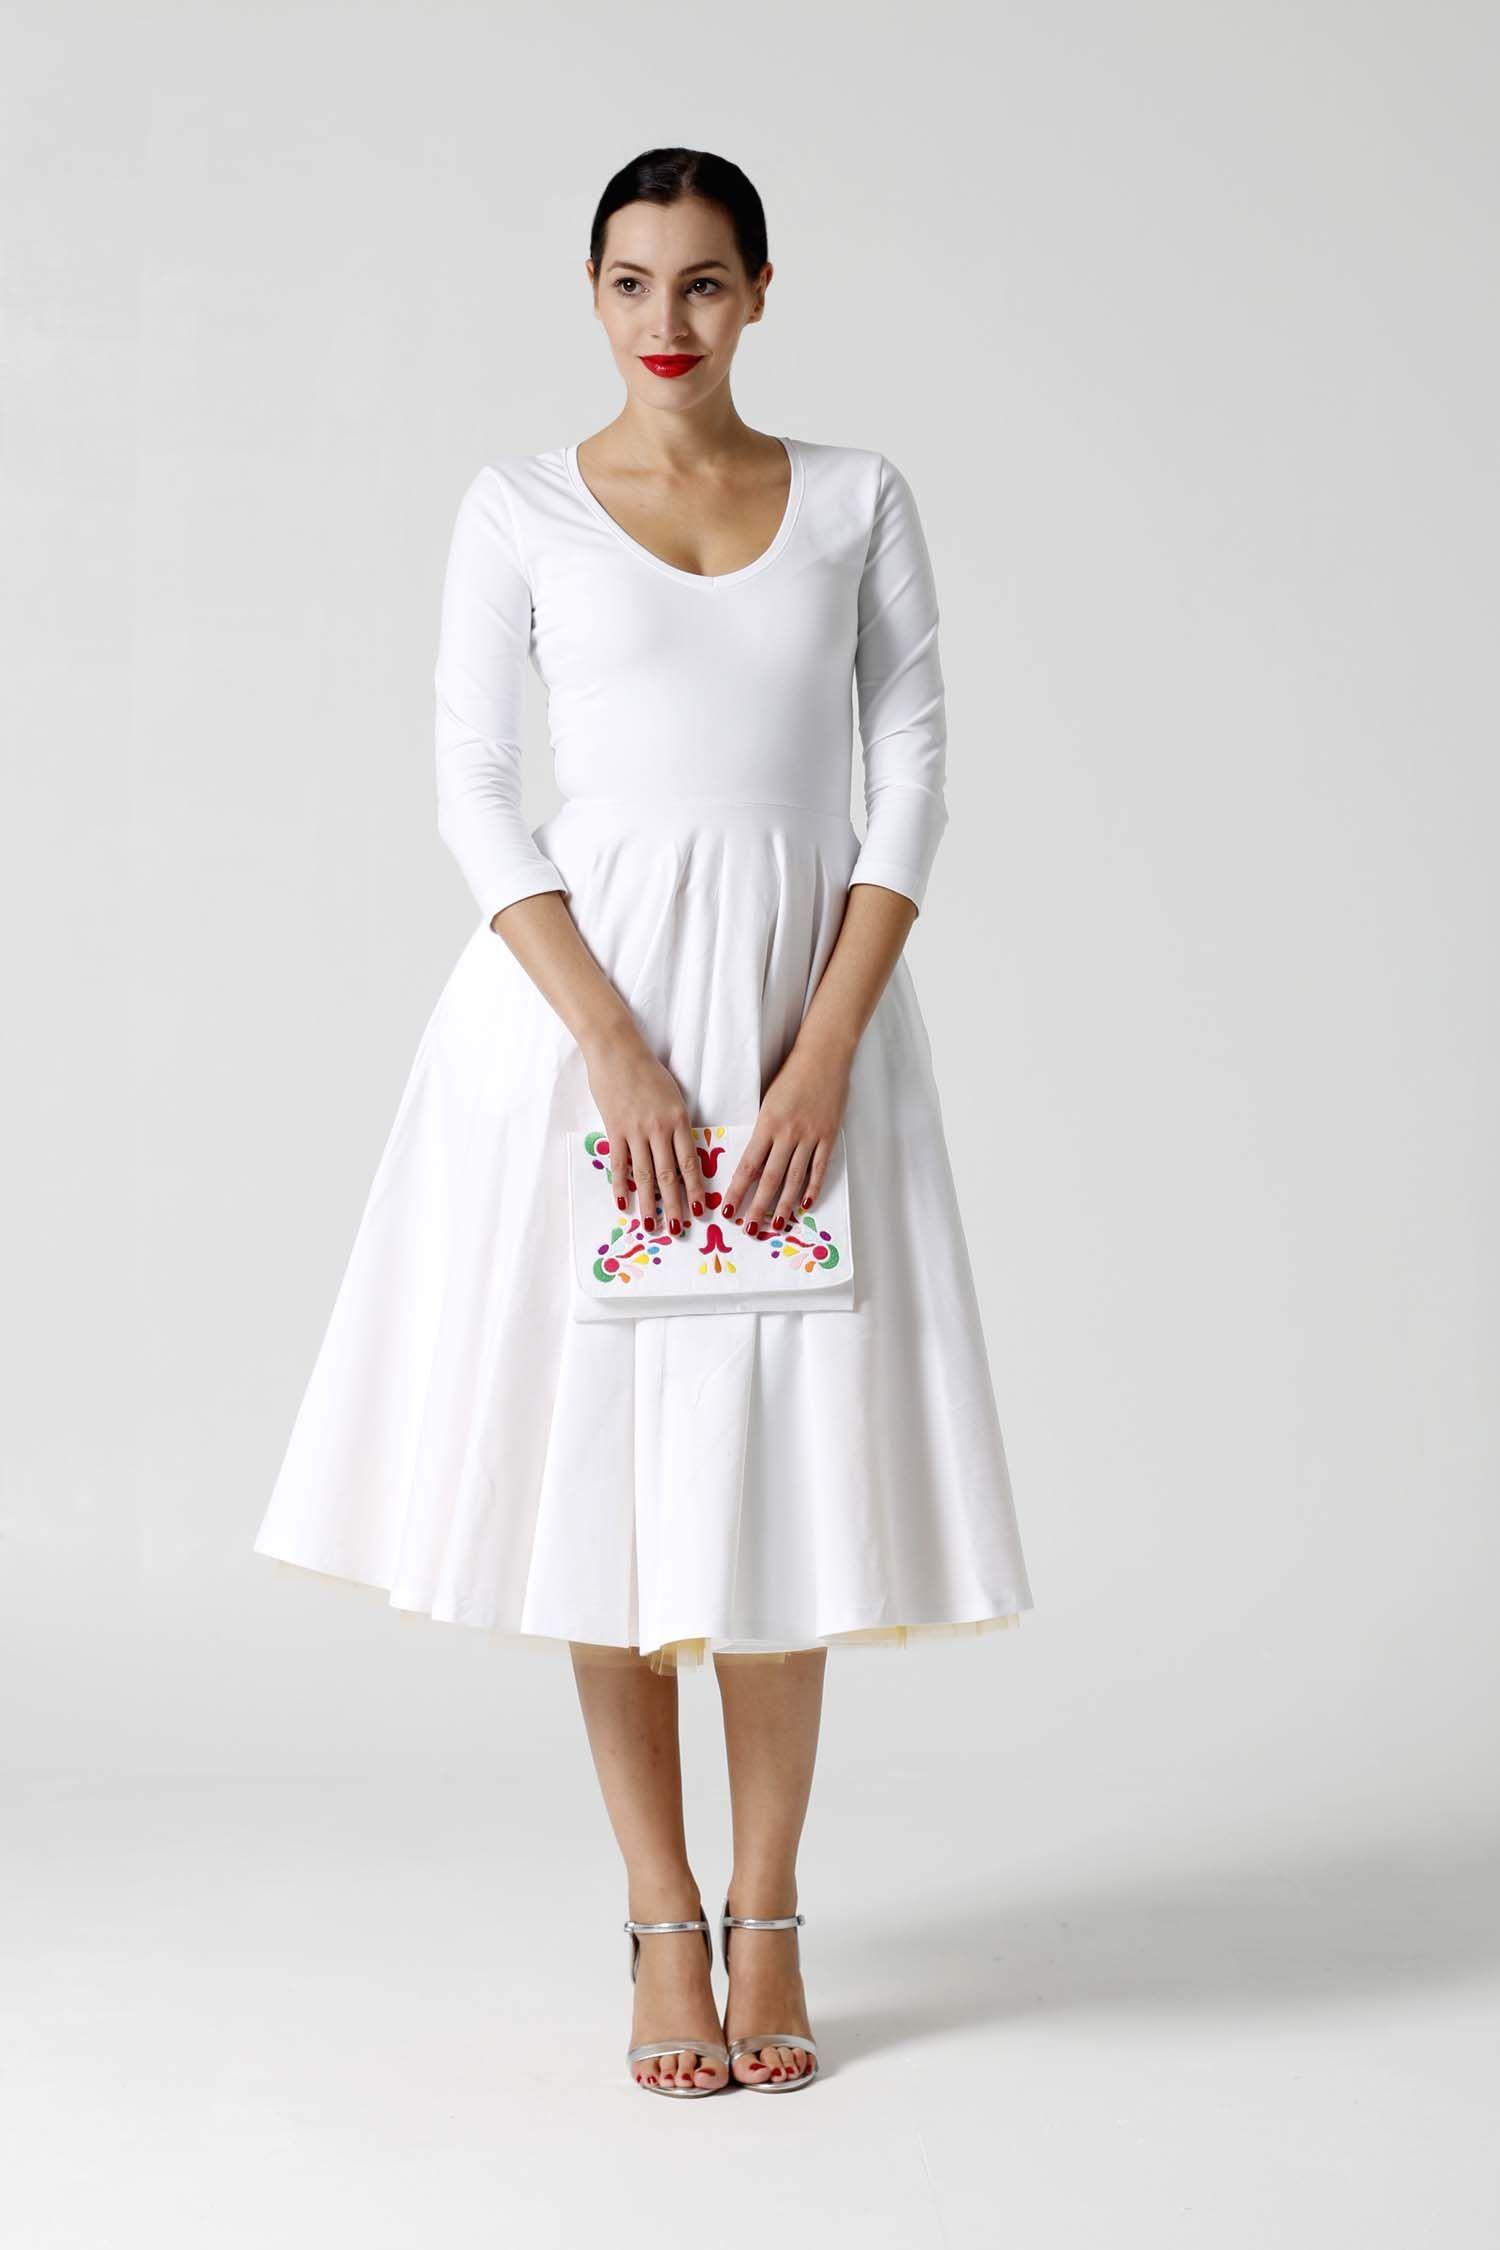 Šaty Midi biele s véčkom   ZuzanaZachar  dd75f6c47e7